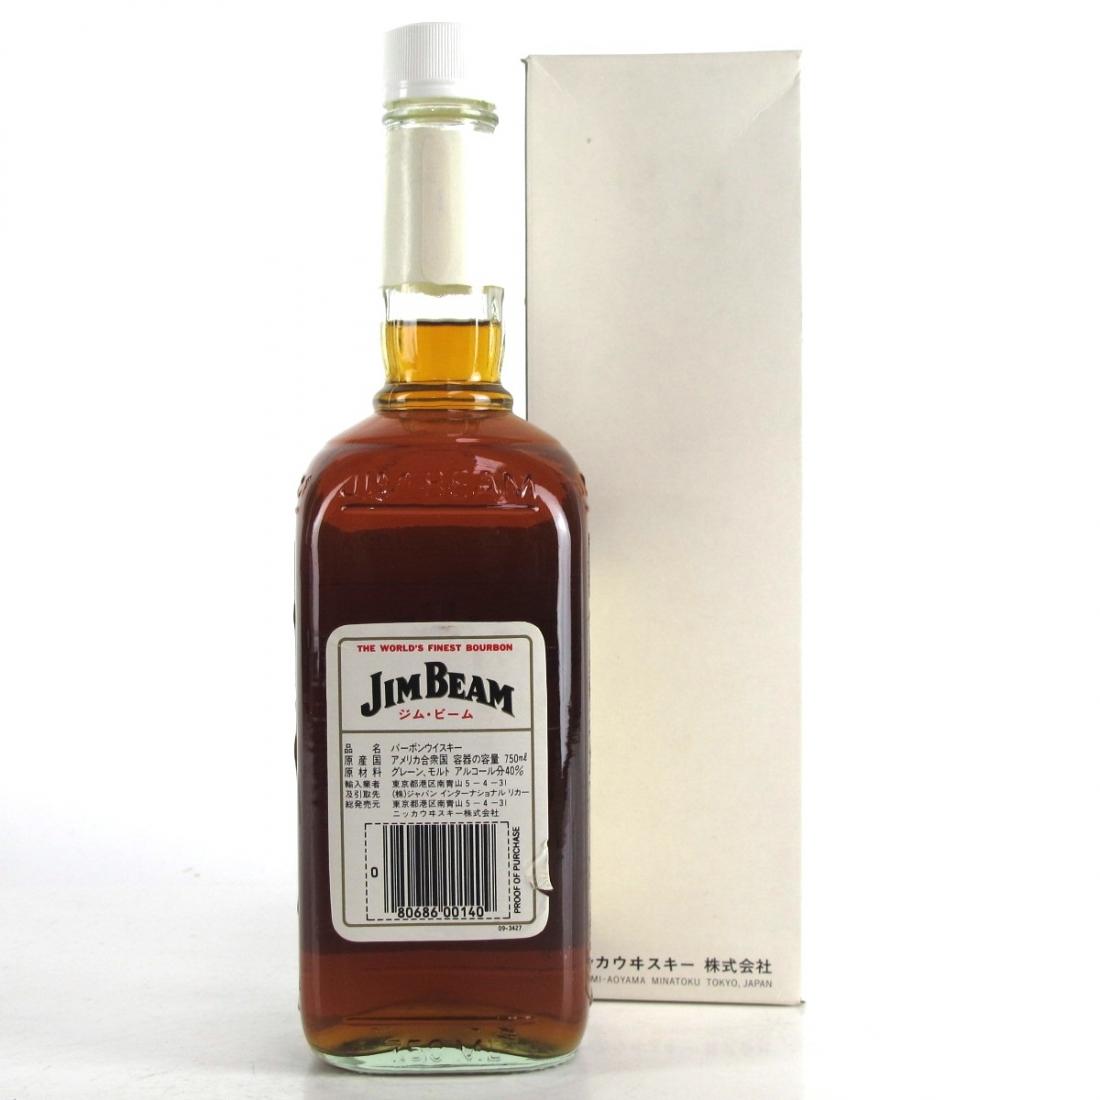 Jim Beam Kentucky Straight Bourbon 1980s / Japanese Import